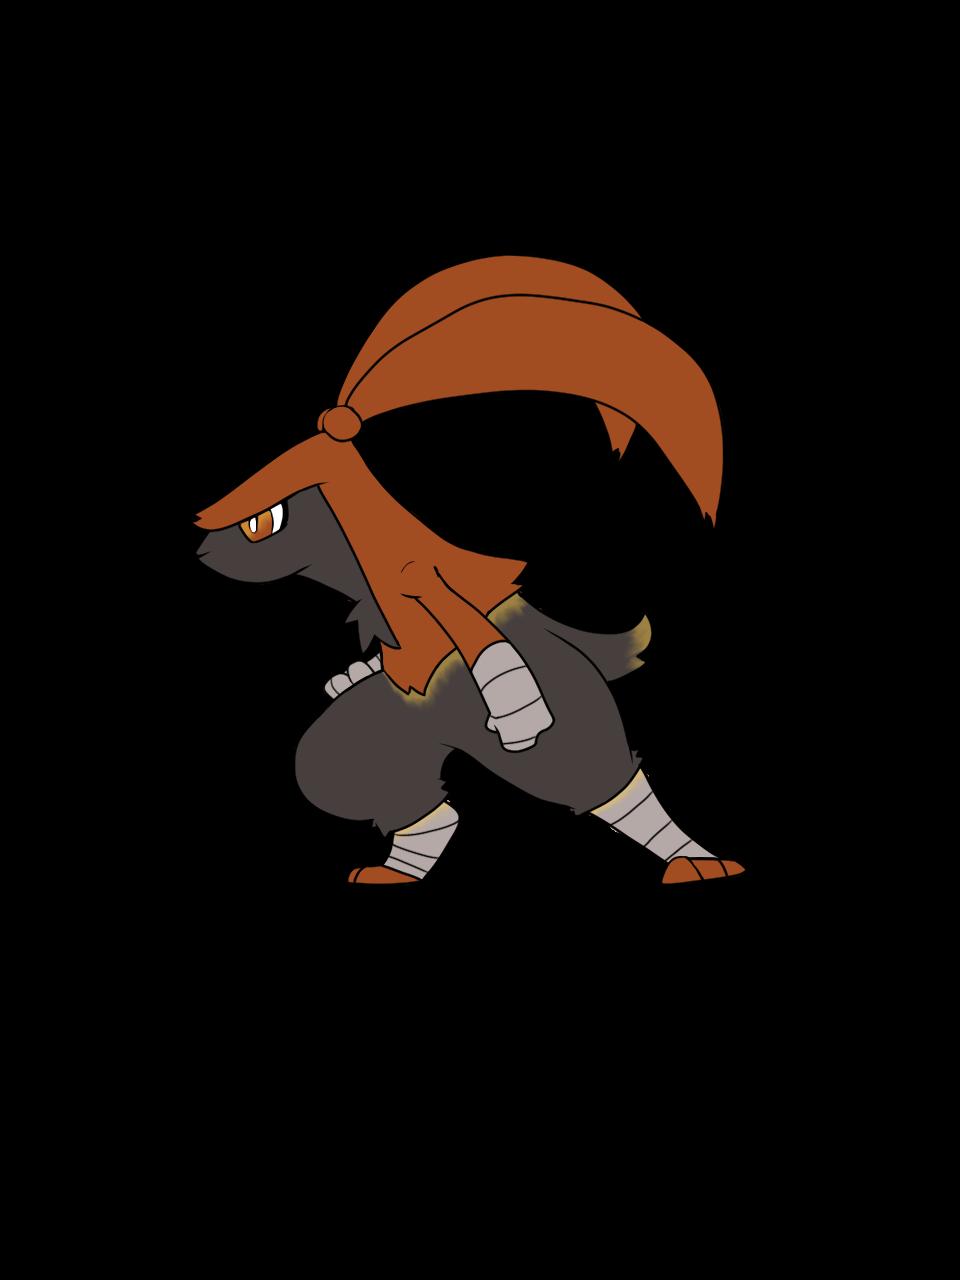 Vp pok mon thread. Rat clipart vole